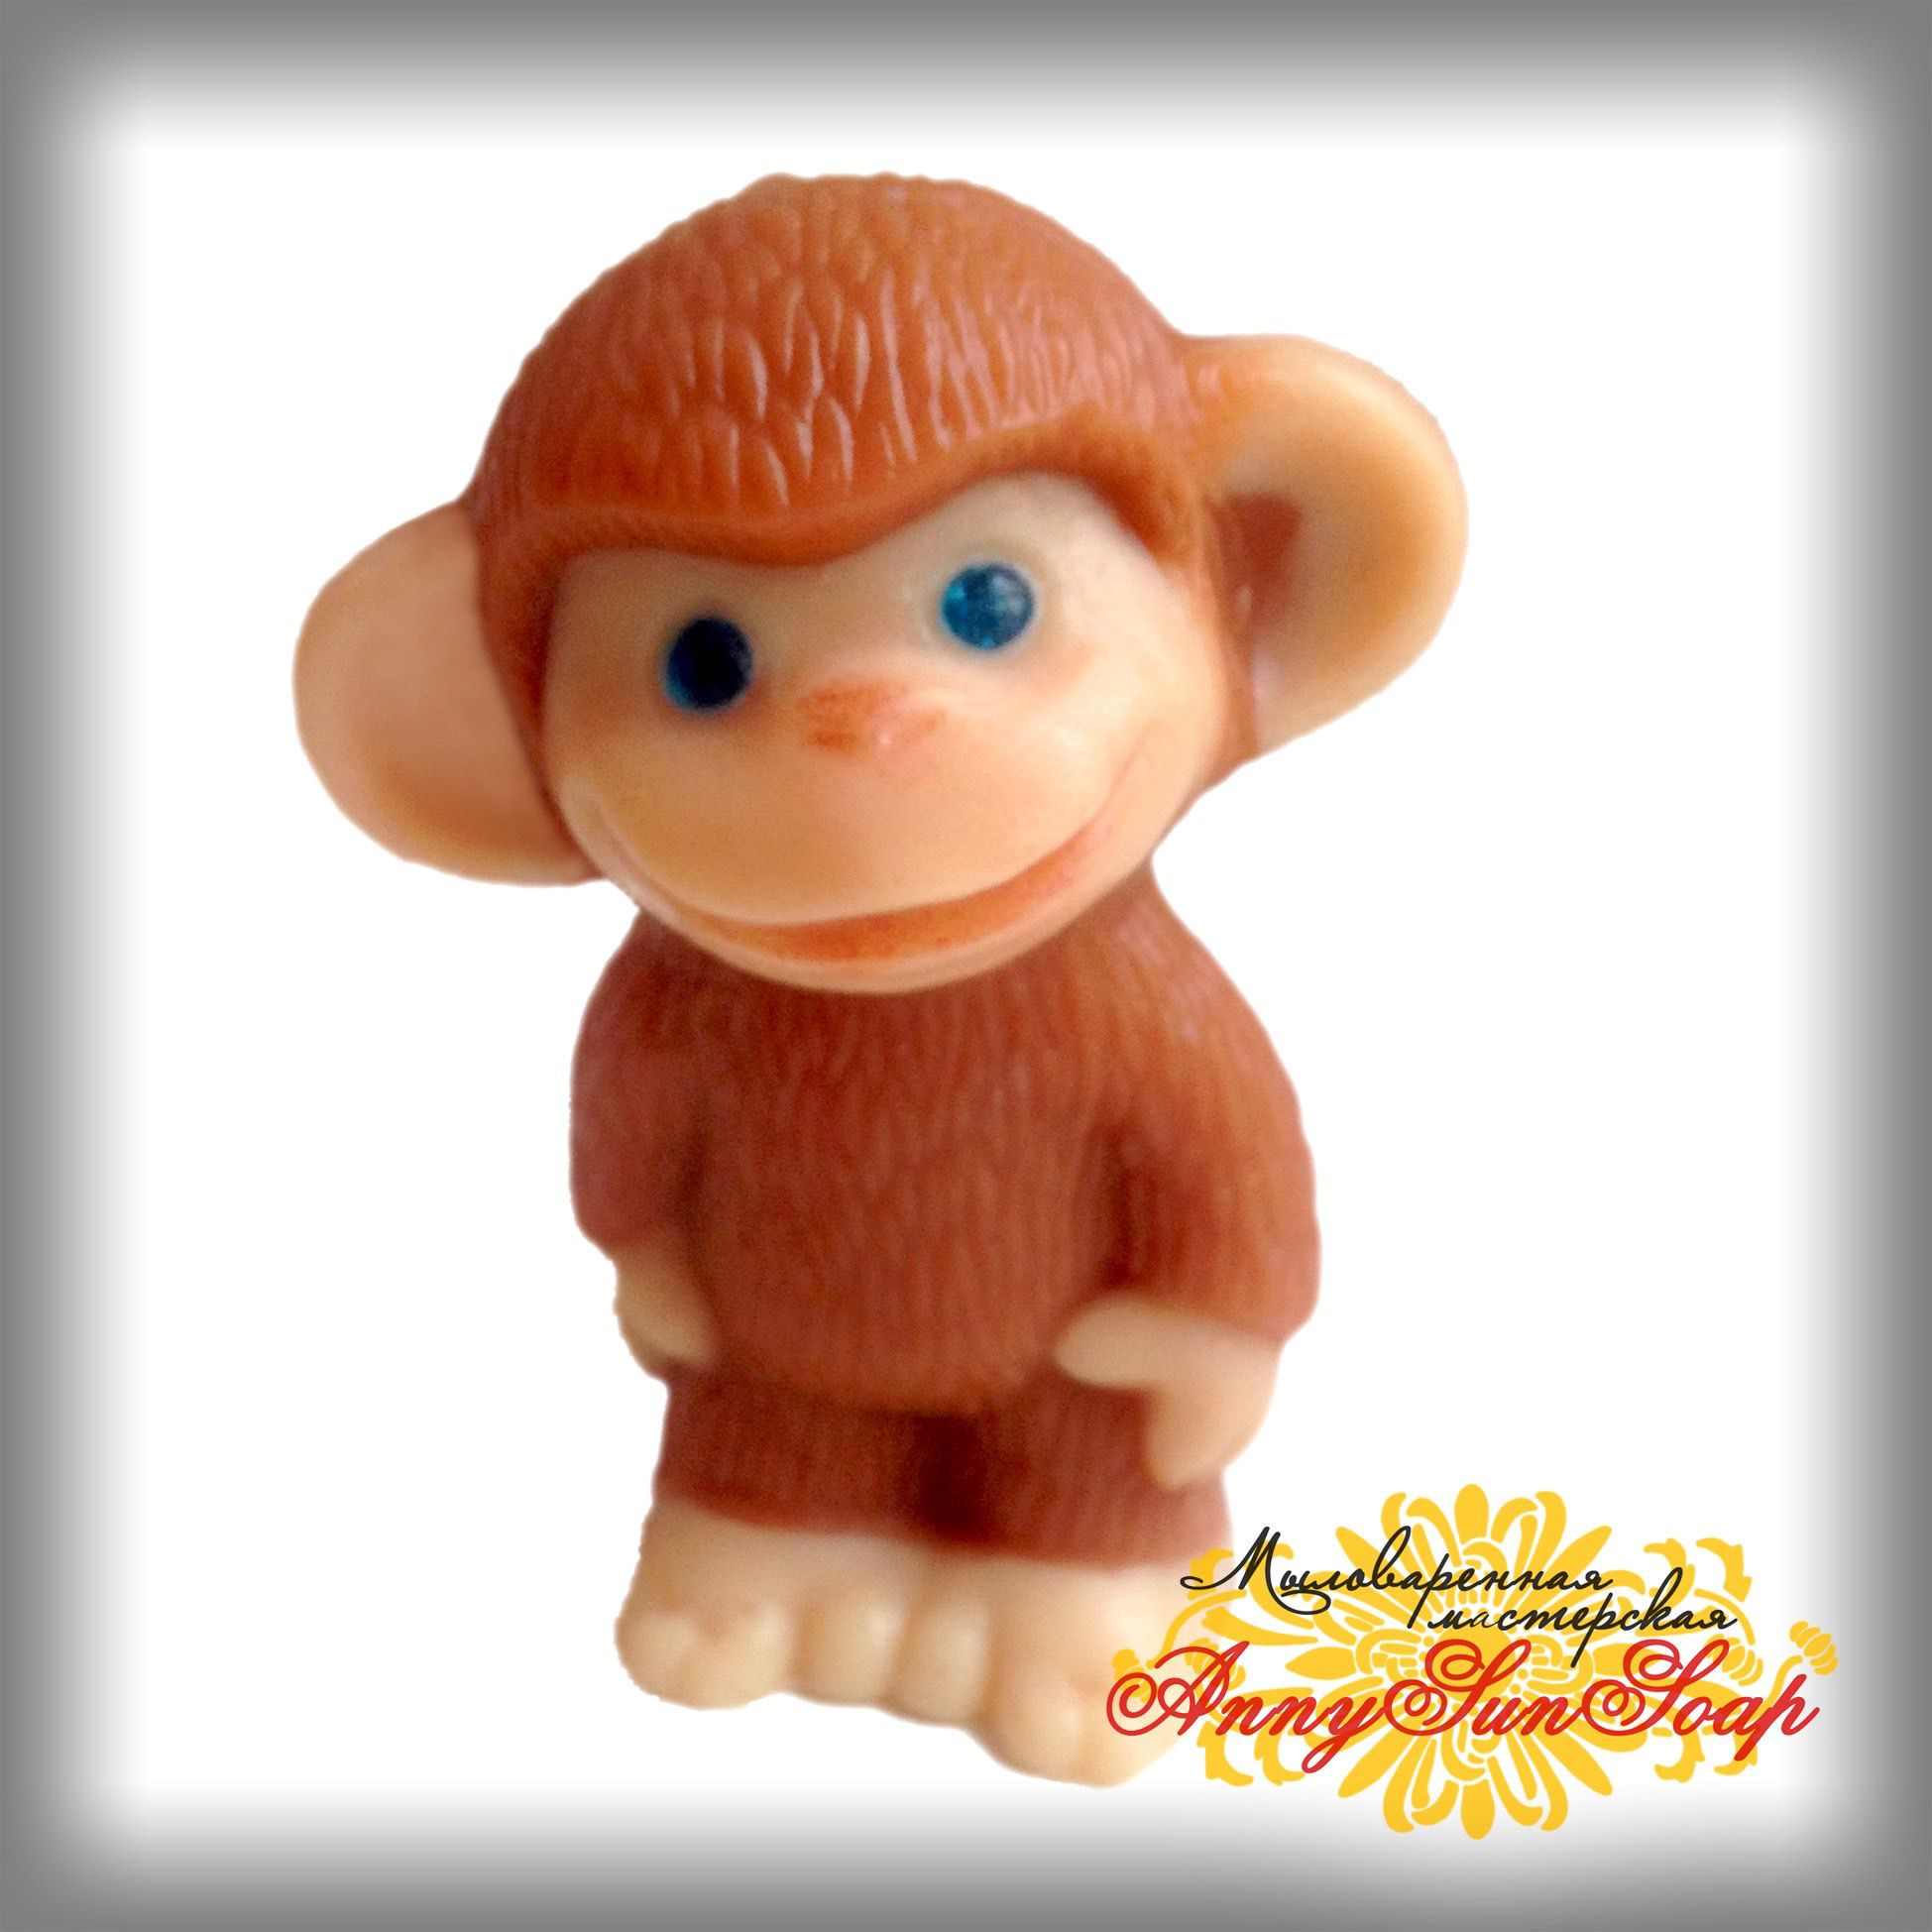 обезьяна подарок символгода мартышка макака символгода2016 животные подарки